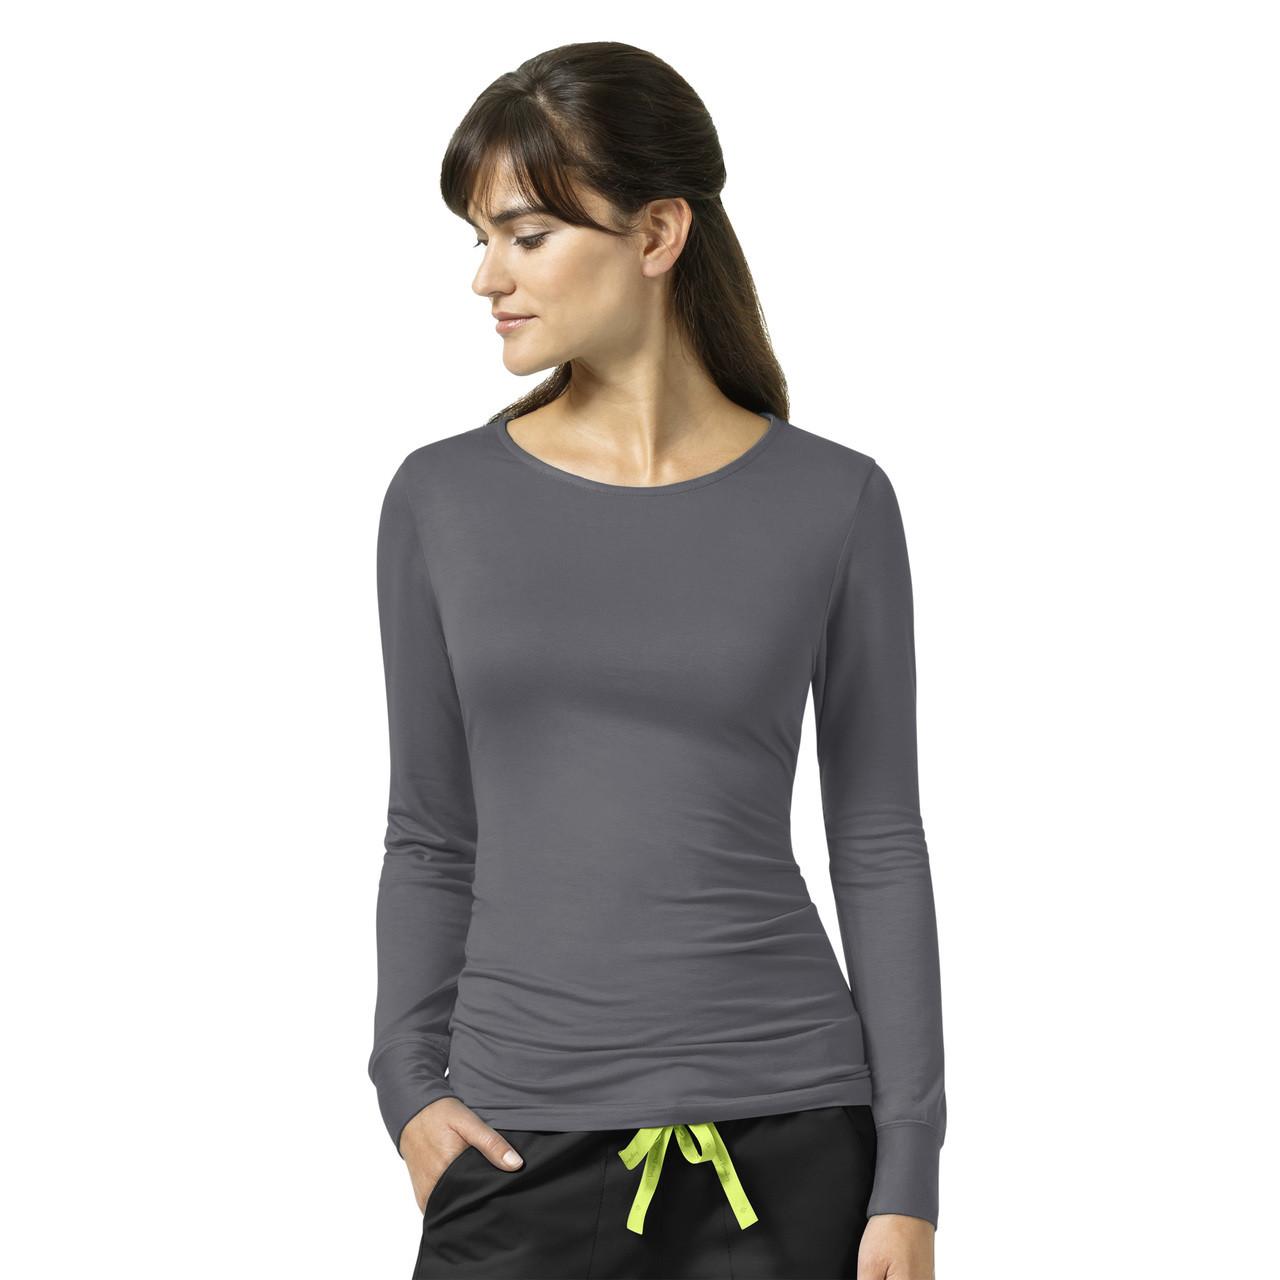 (V2109) Vera Bradley Signature Coco Knit Long Sleeve Underscrub T-Shirt